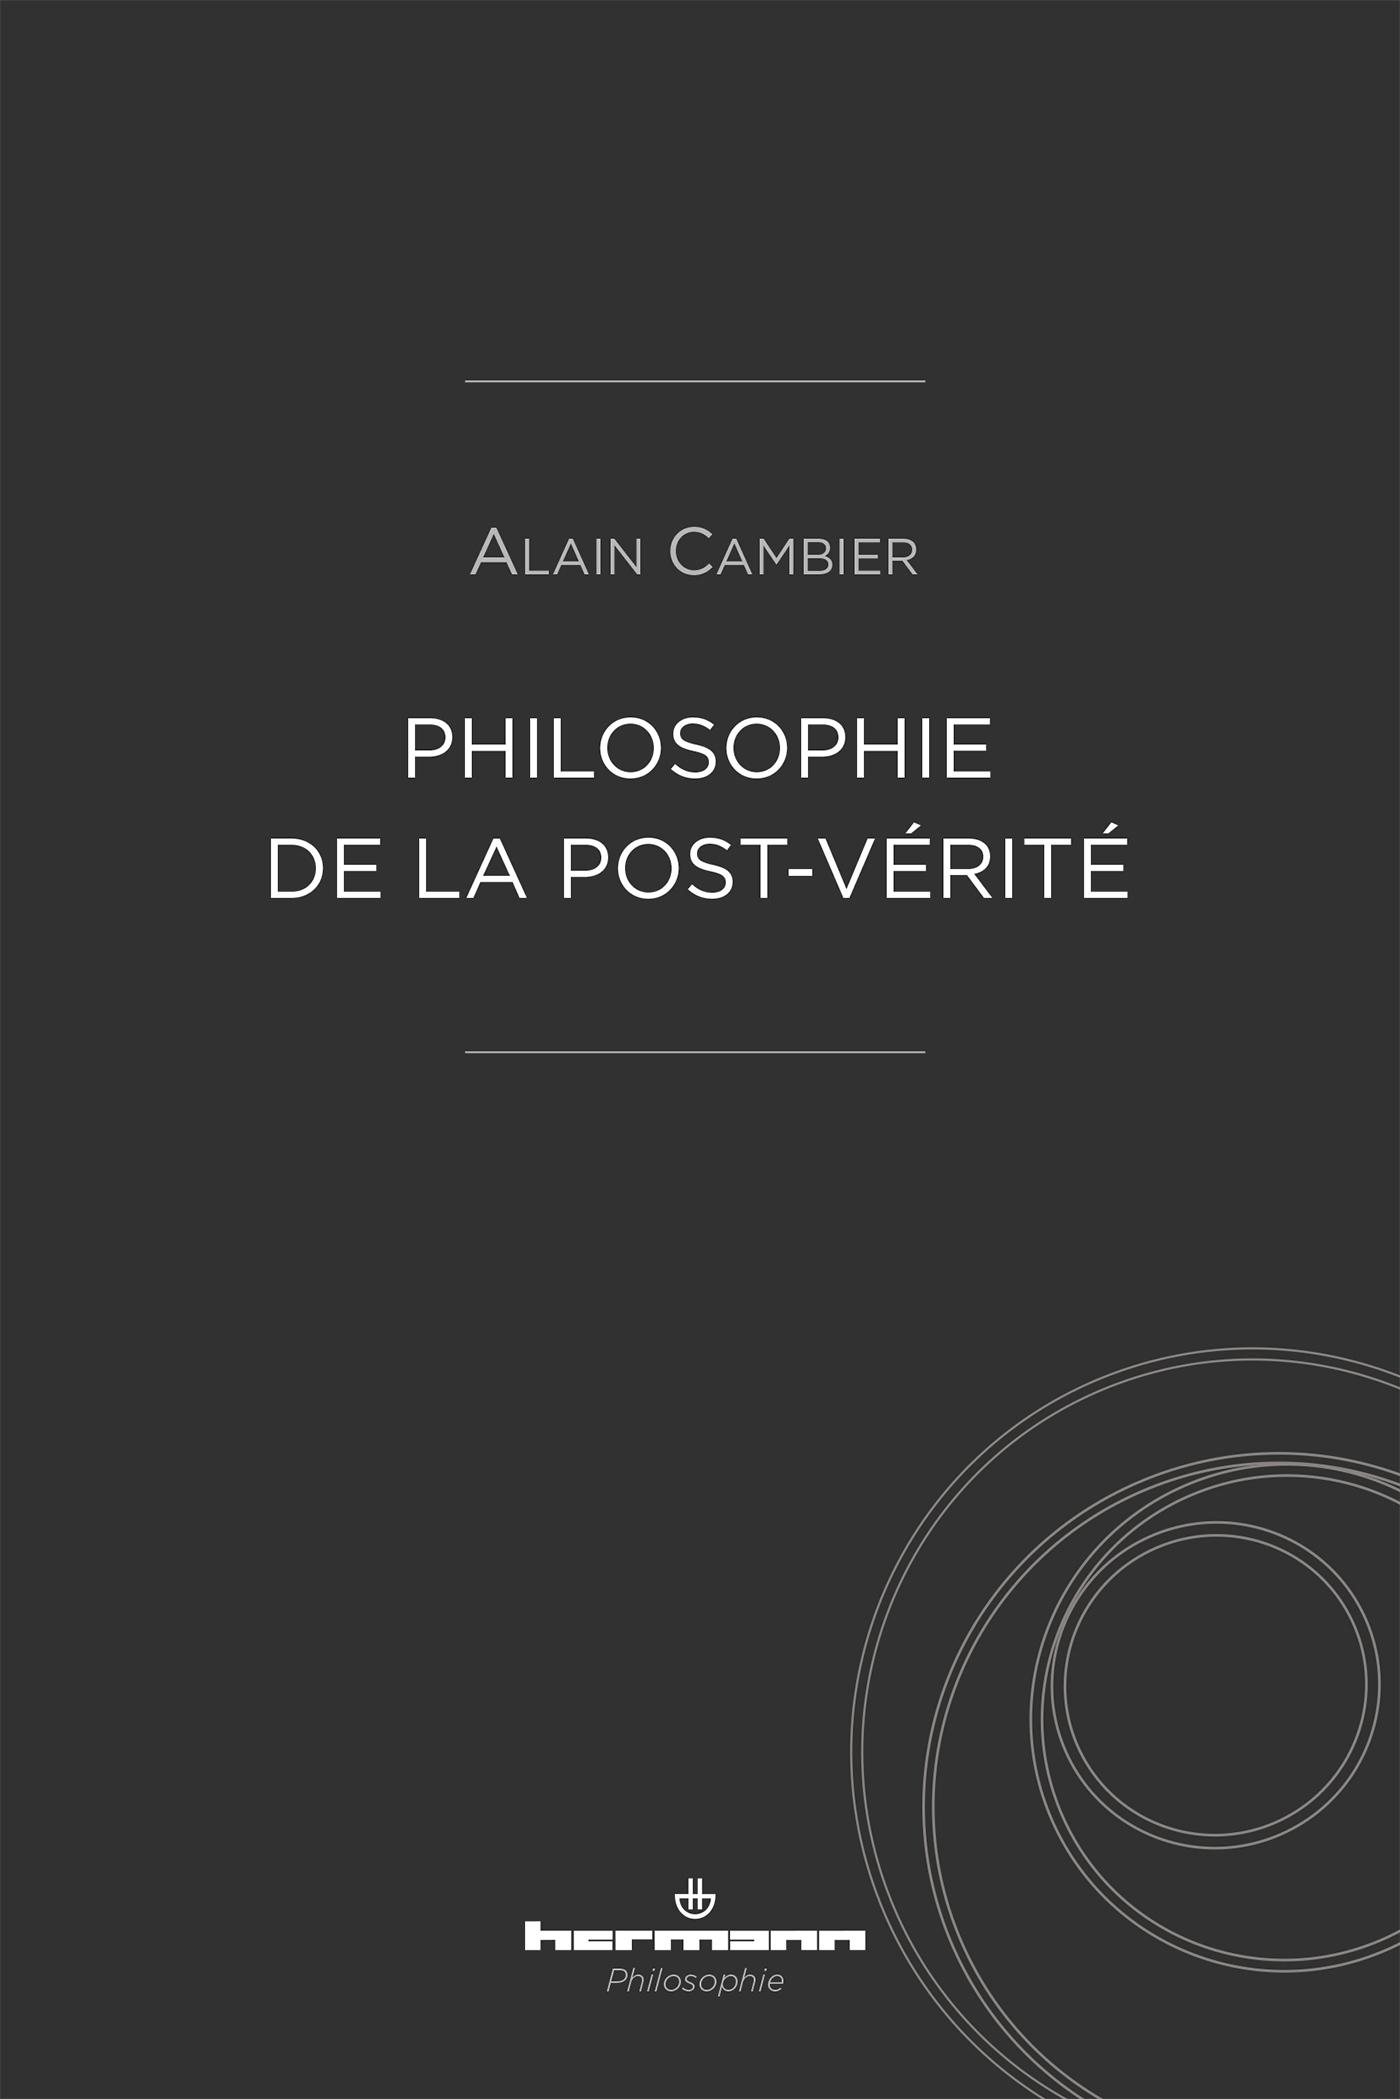 PHILOSOPHIE DE LA POST-VERITE